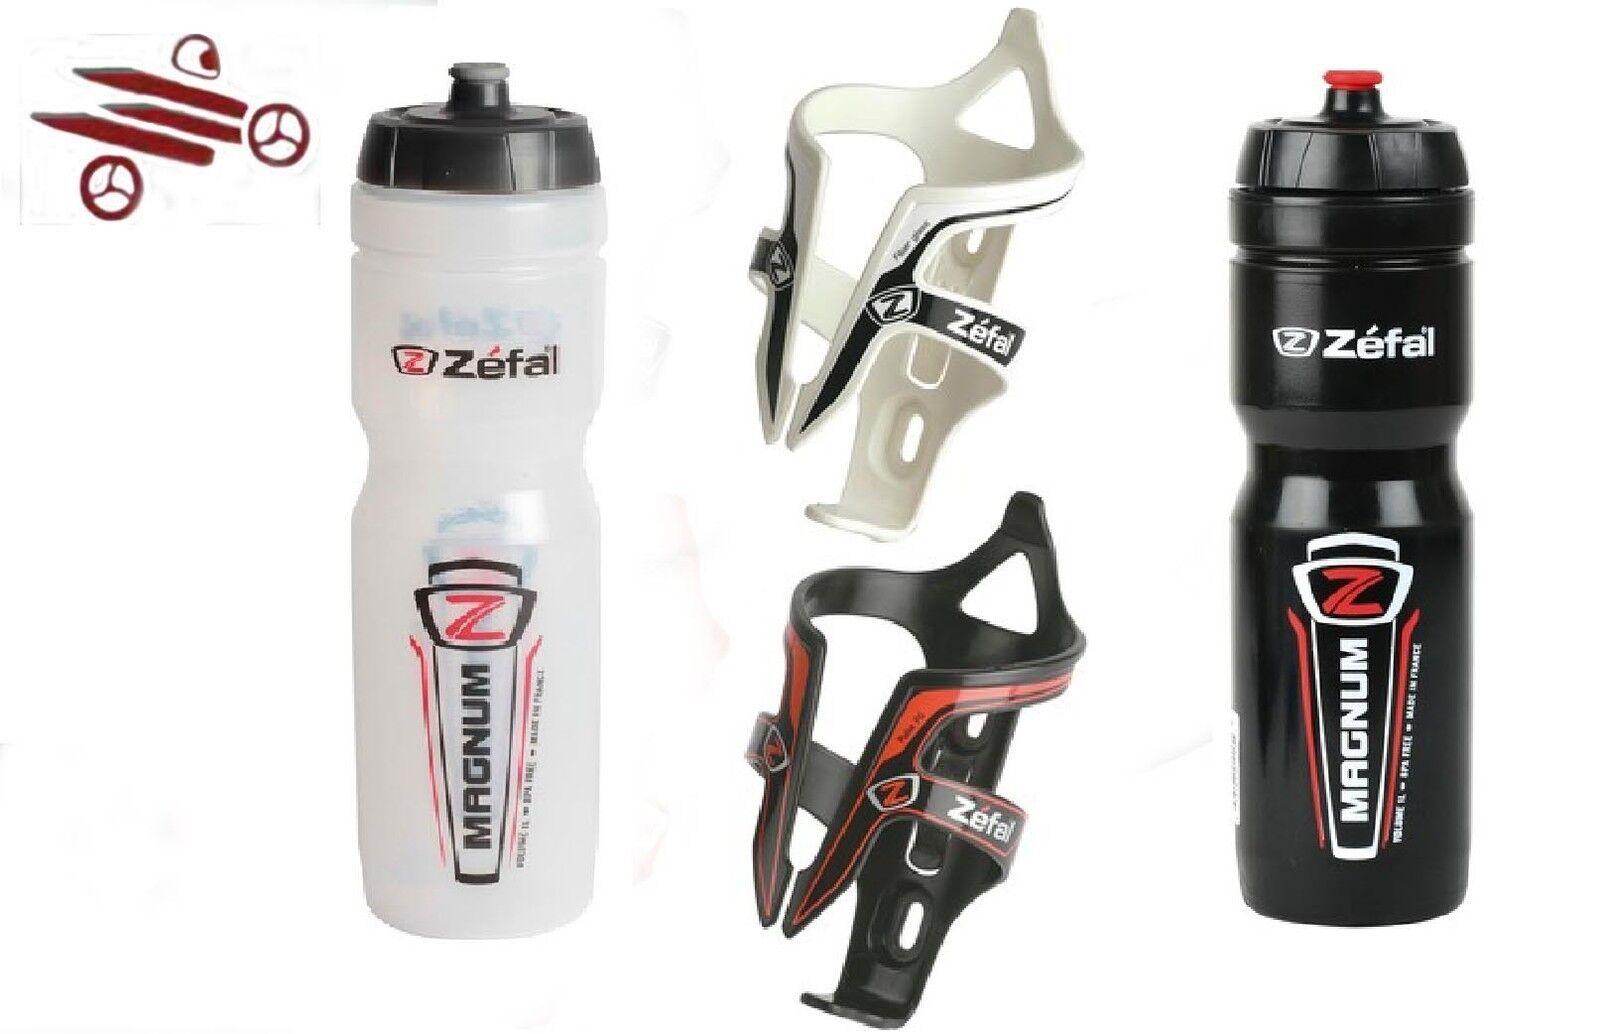 Zefal bicicleta botella botella botella magnum-portabidones vidrio fiber-colores diferentes c00f35